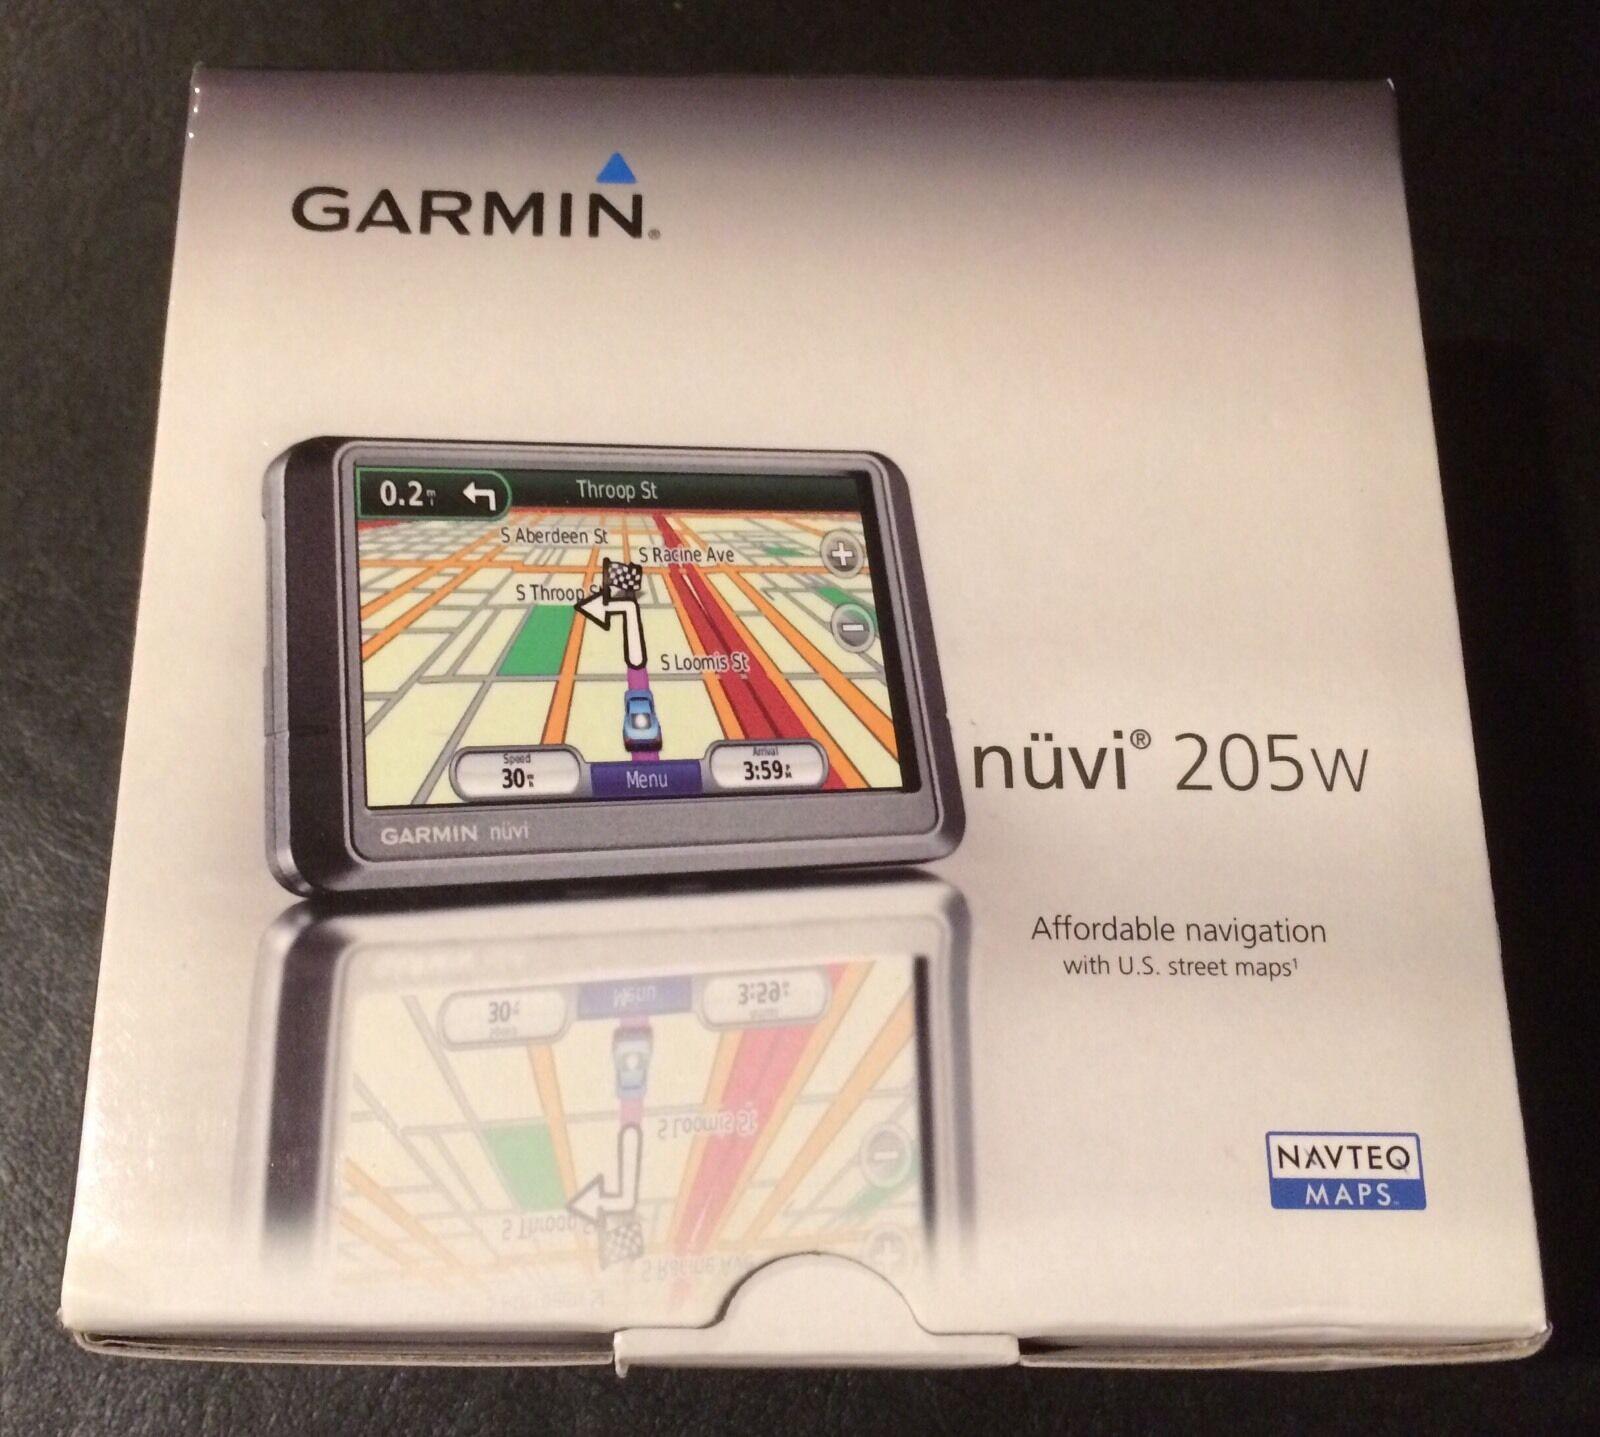 NEW IN BOX Garmin Nuvi 205 3.5-Inch Portable GPS Navigator